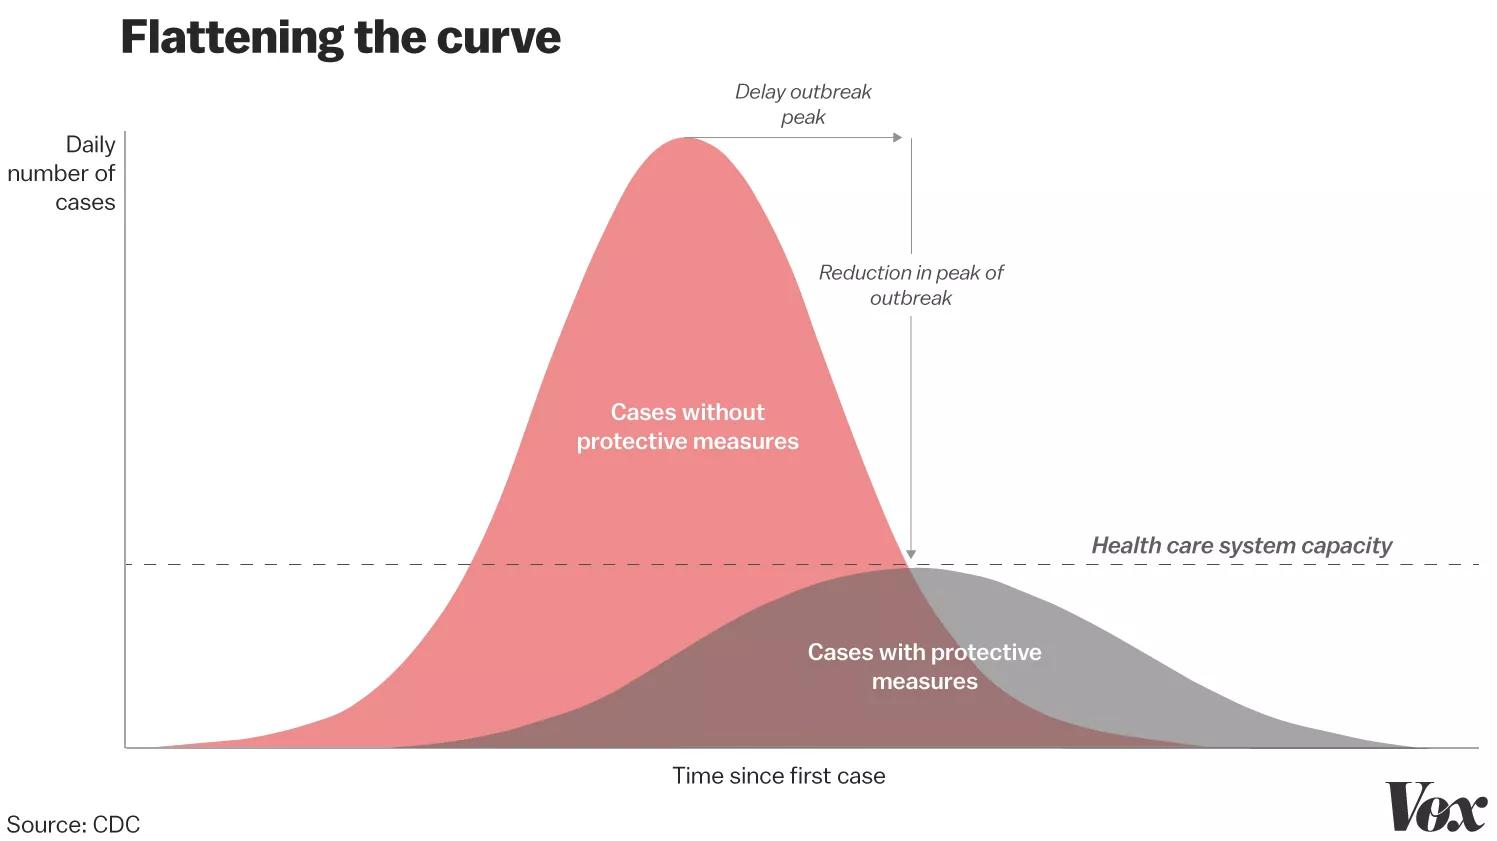 Flattennig the Curve